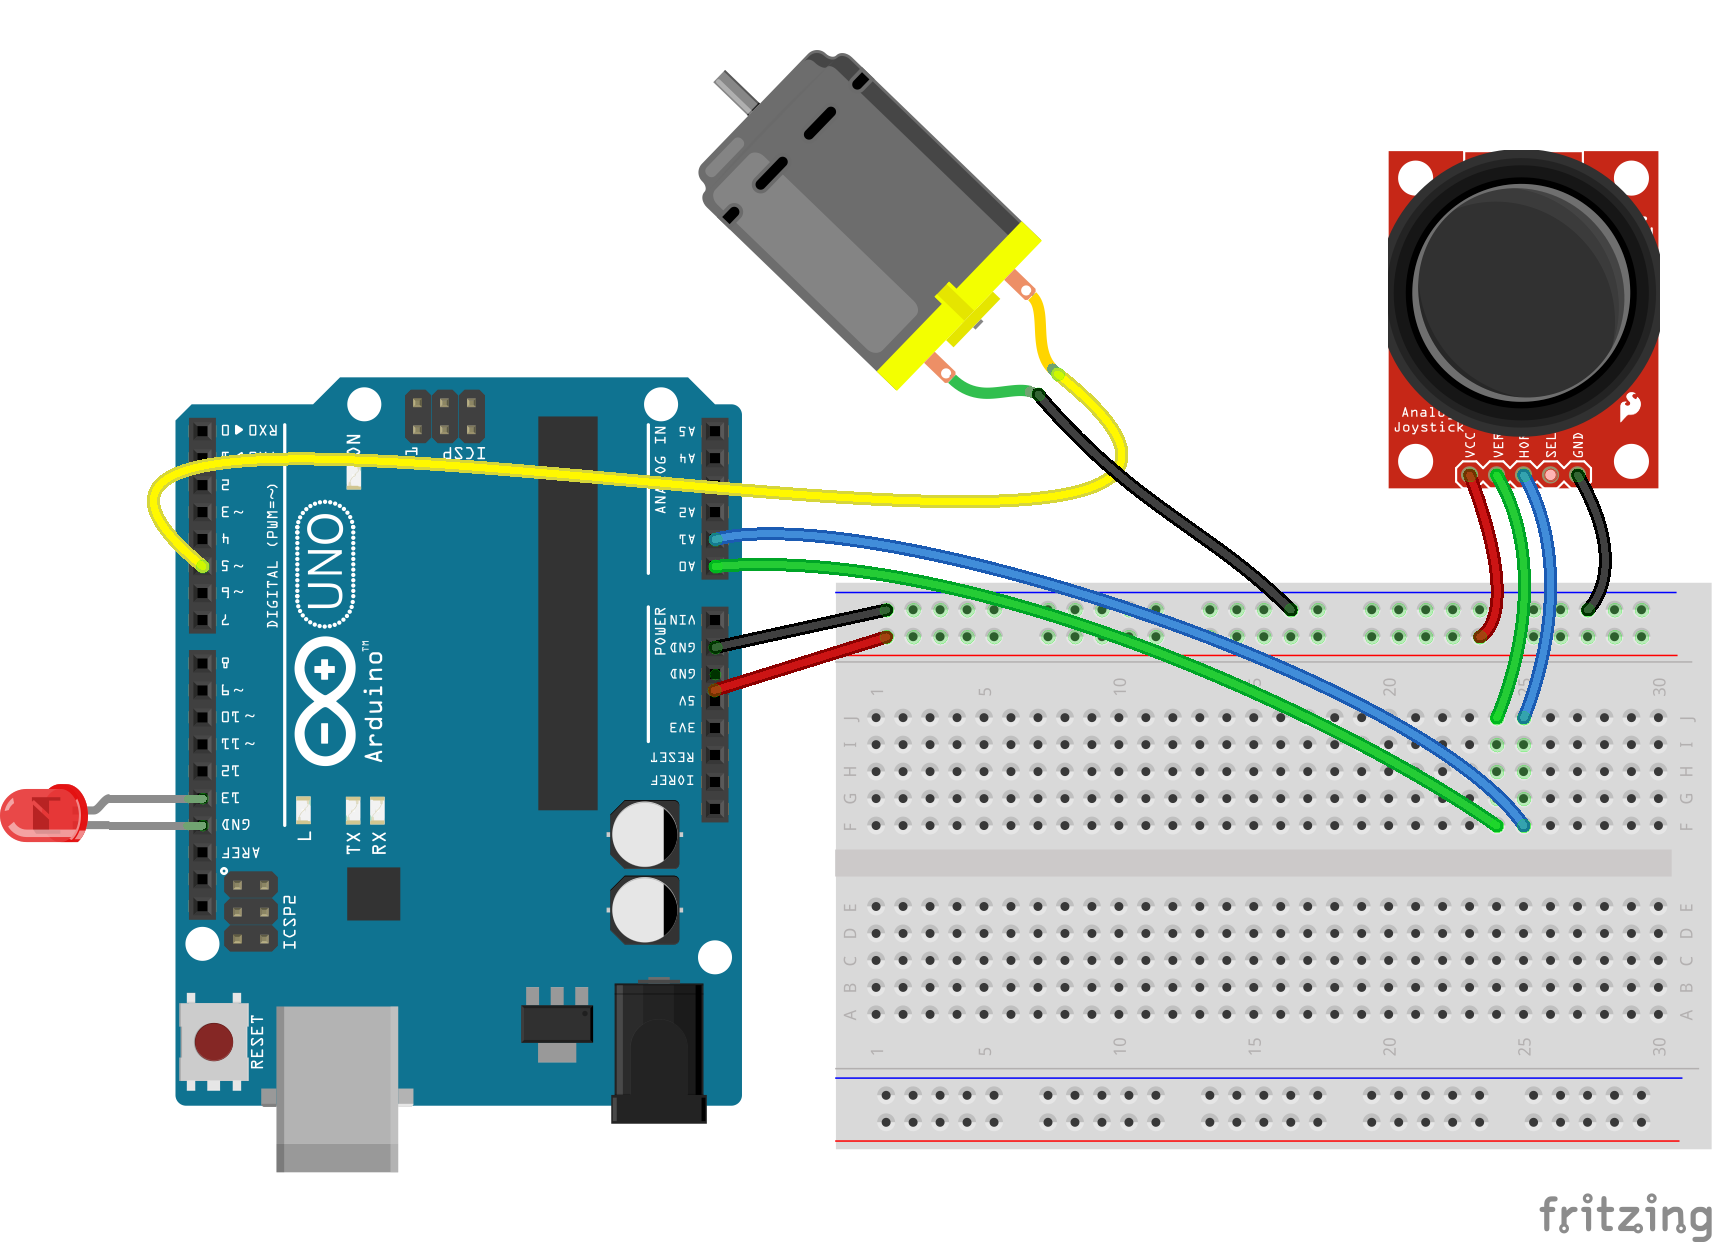 Servo motor control in Arduino code, circuits